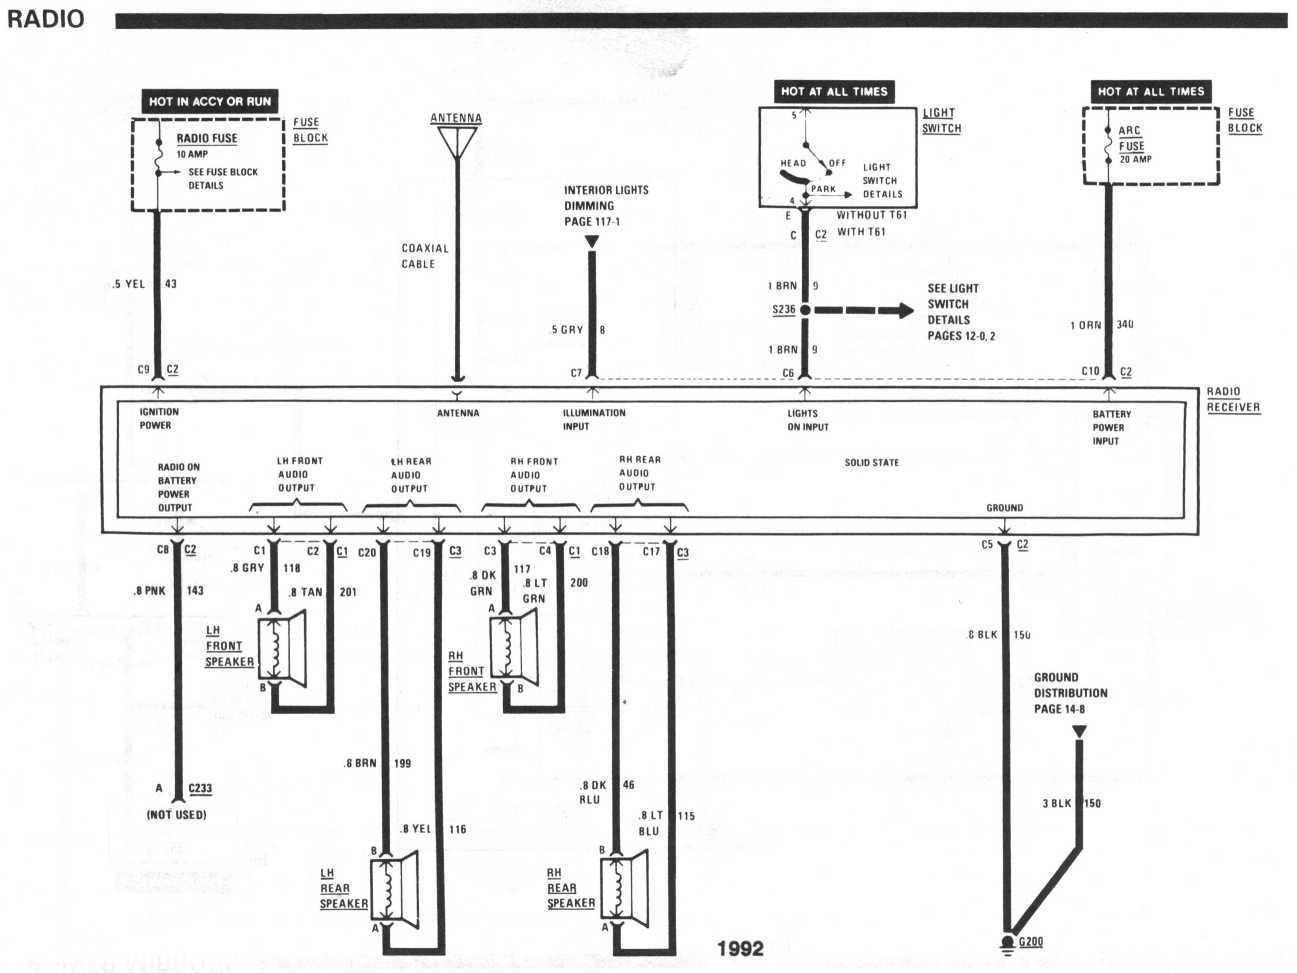 91 camaro radio wiring diagram